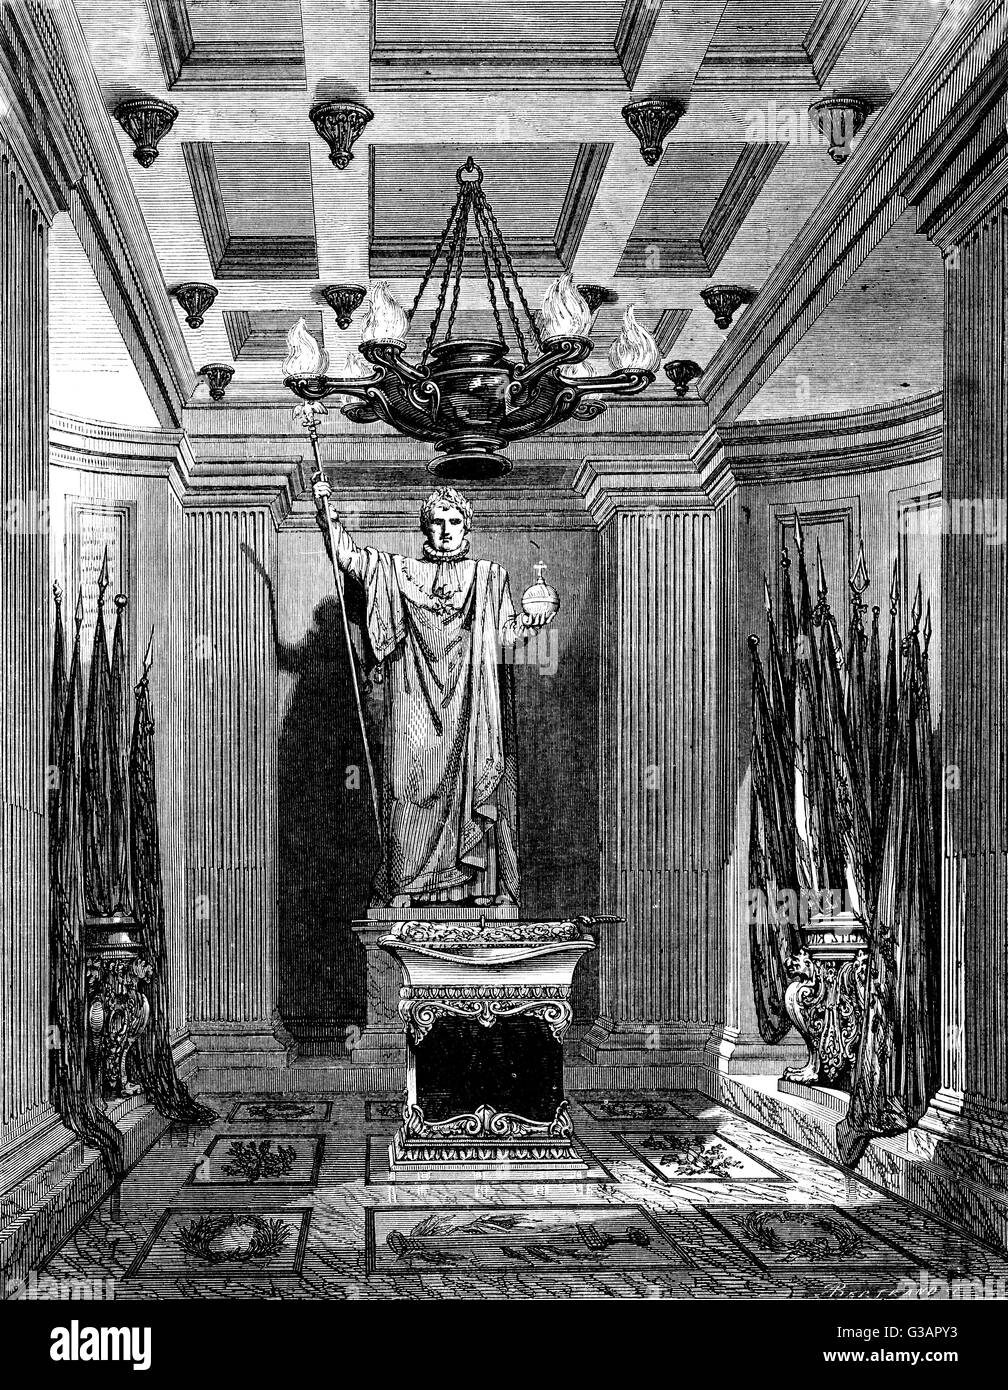 Paris, France - Invalides, Tombeau de Napoleon II, son of Napoleon Bonaparte.     Date: circa 1855 Stock Photo